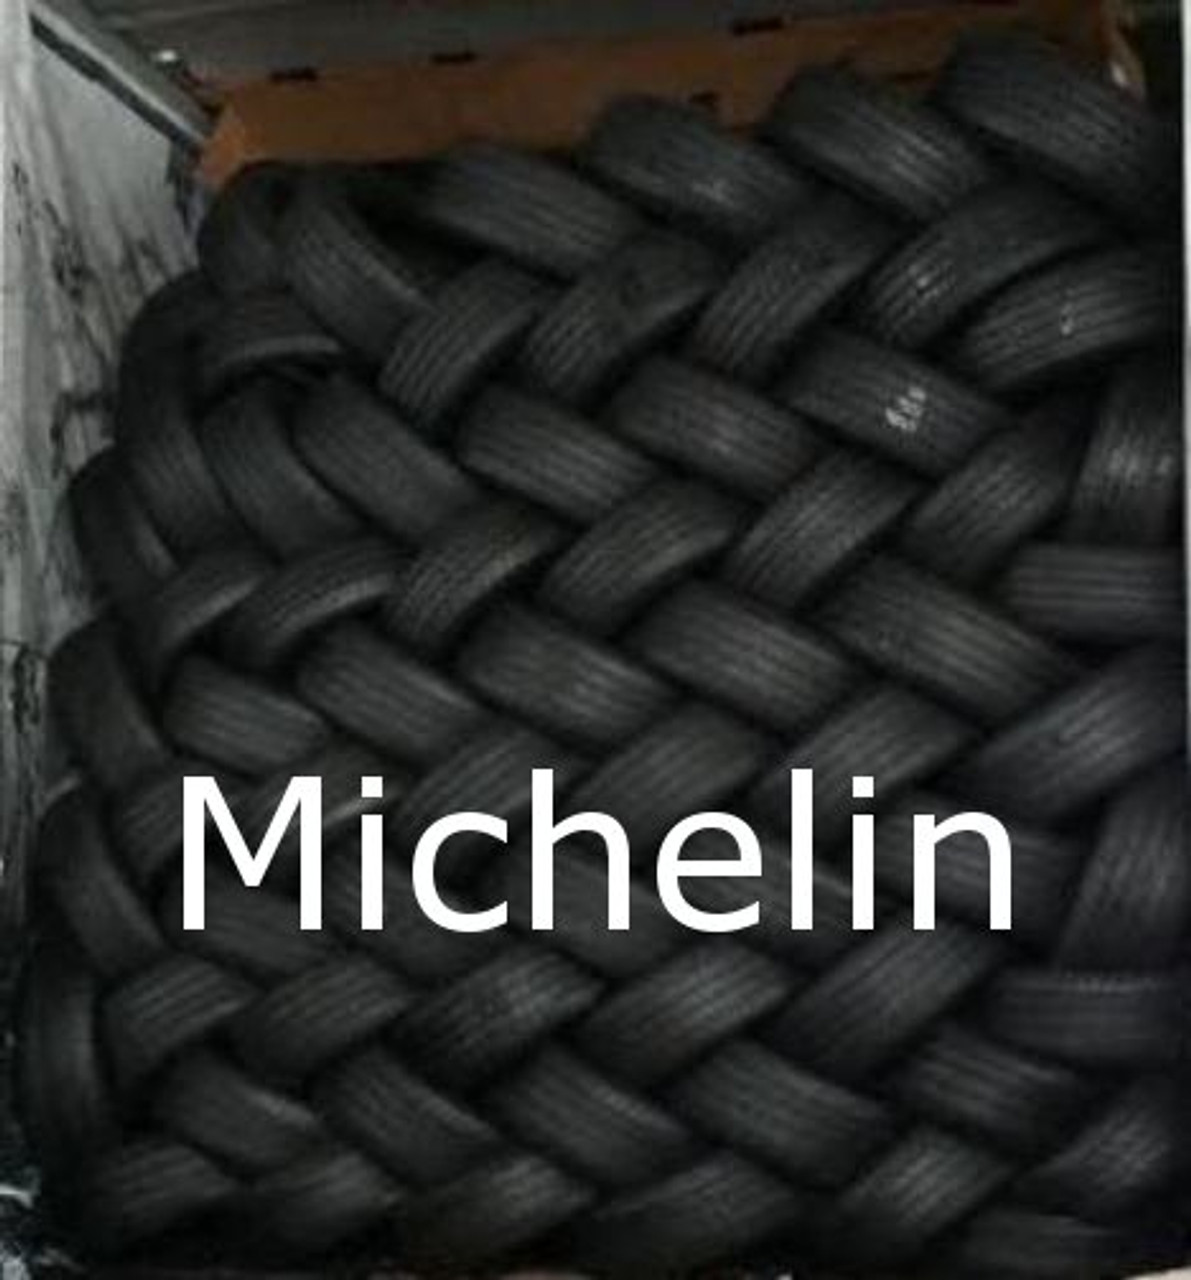 Used Take Off 225 50 17 Michelin Tire P225/50R17